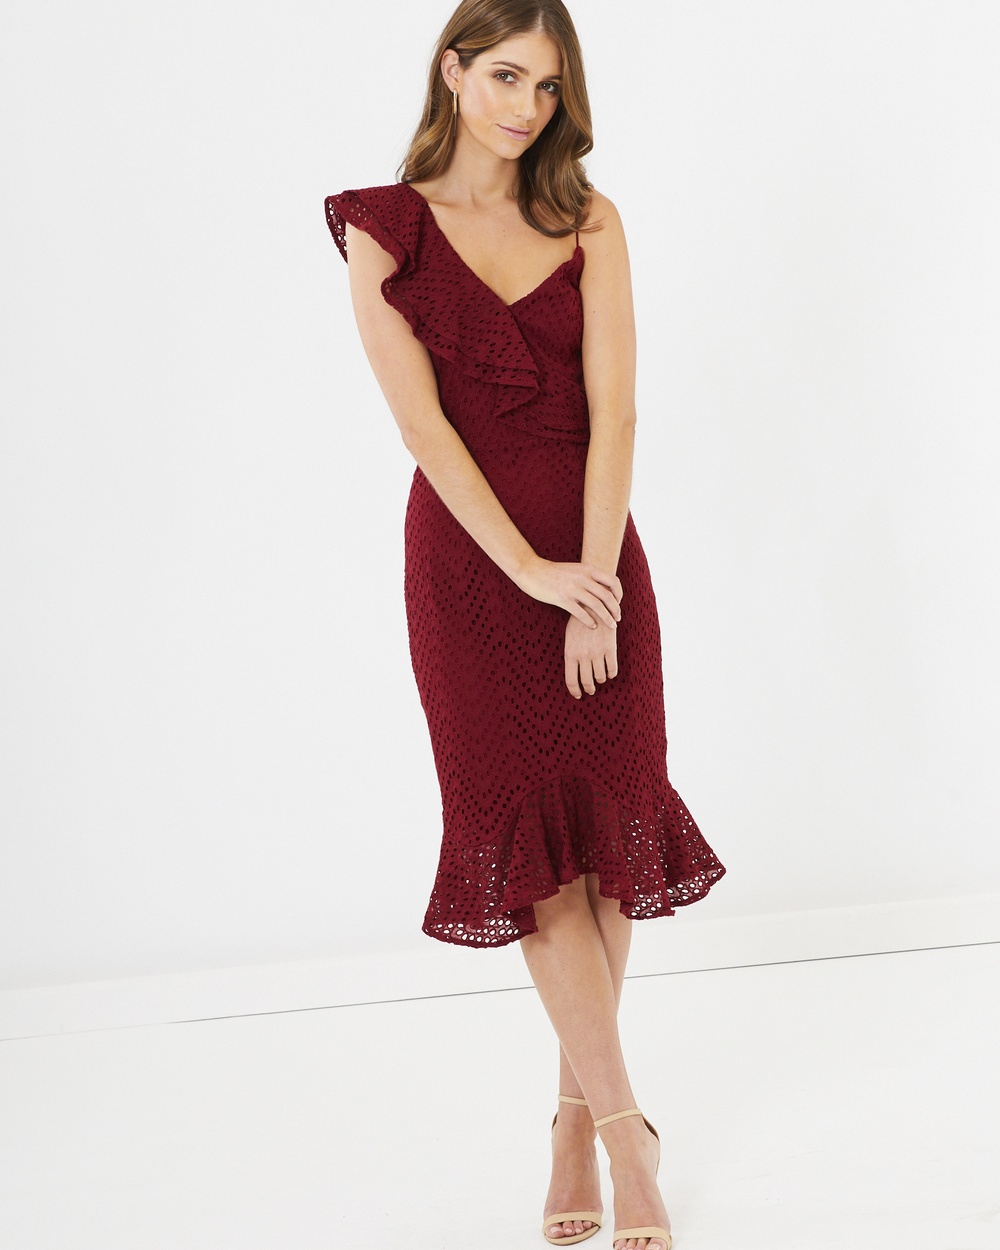 CHANCERY Charlize Dress Bridesmaid Dresses Burgundy Lace Charlize Dress